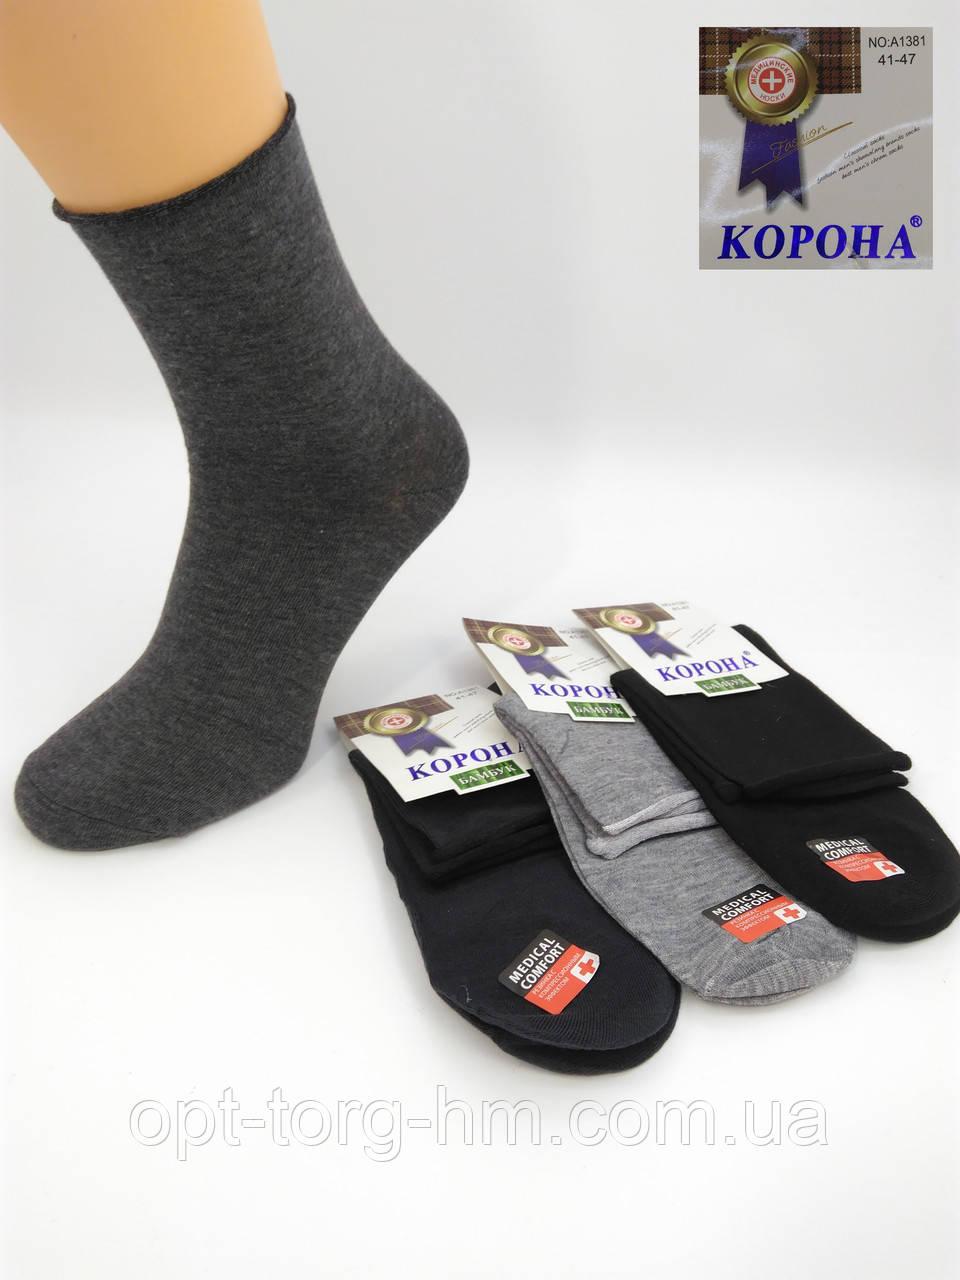 Мужские медицинские носки Корона. В упаковке 12 пар. Размер 41-47